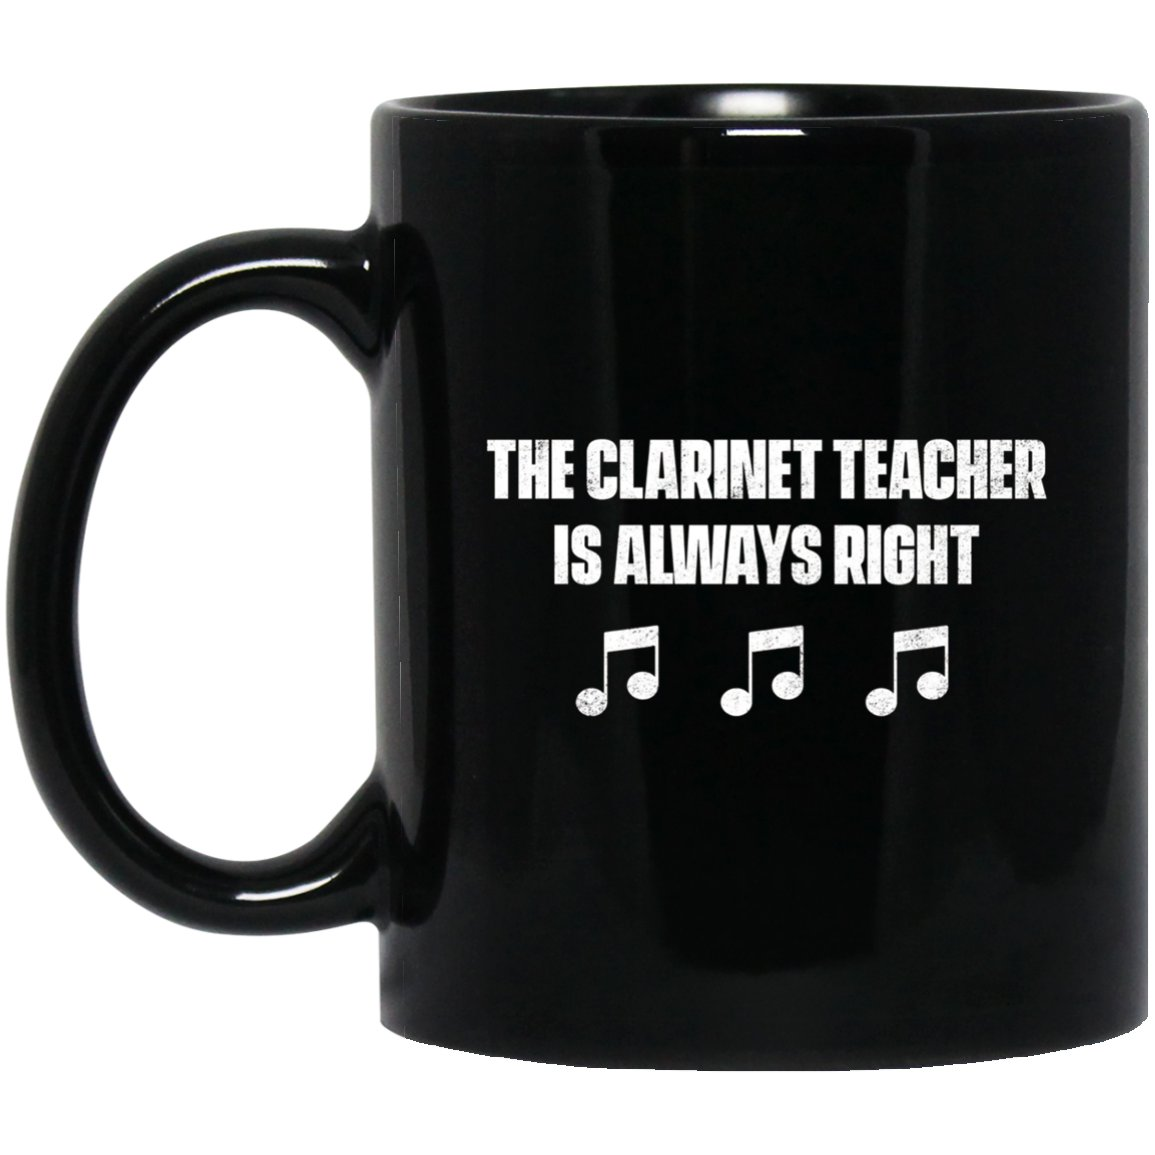 The Clarinet Teacher Is Always Right Black  Mug Black Ceramic 11oz Coffee Tea Cup